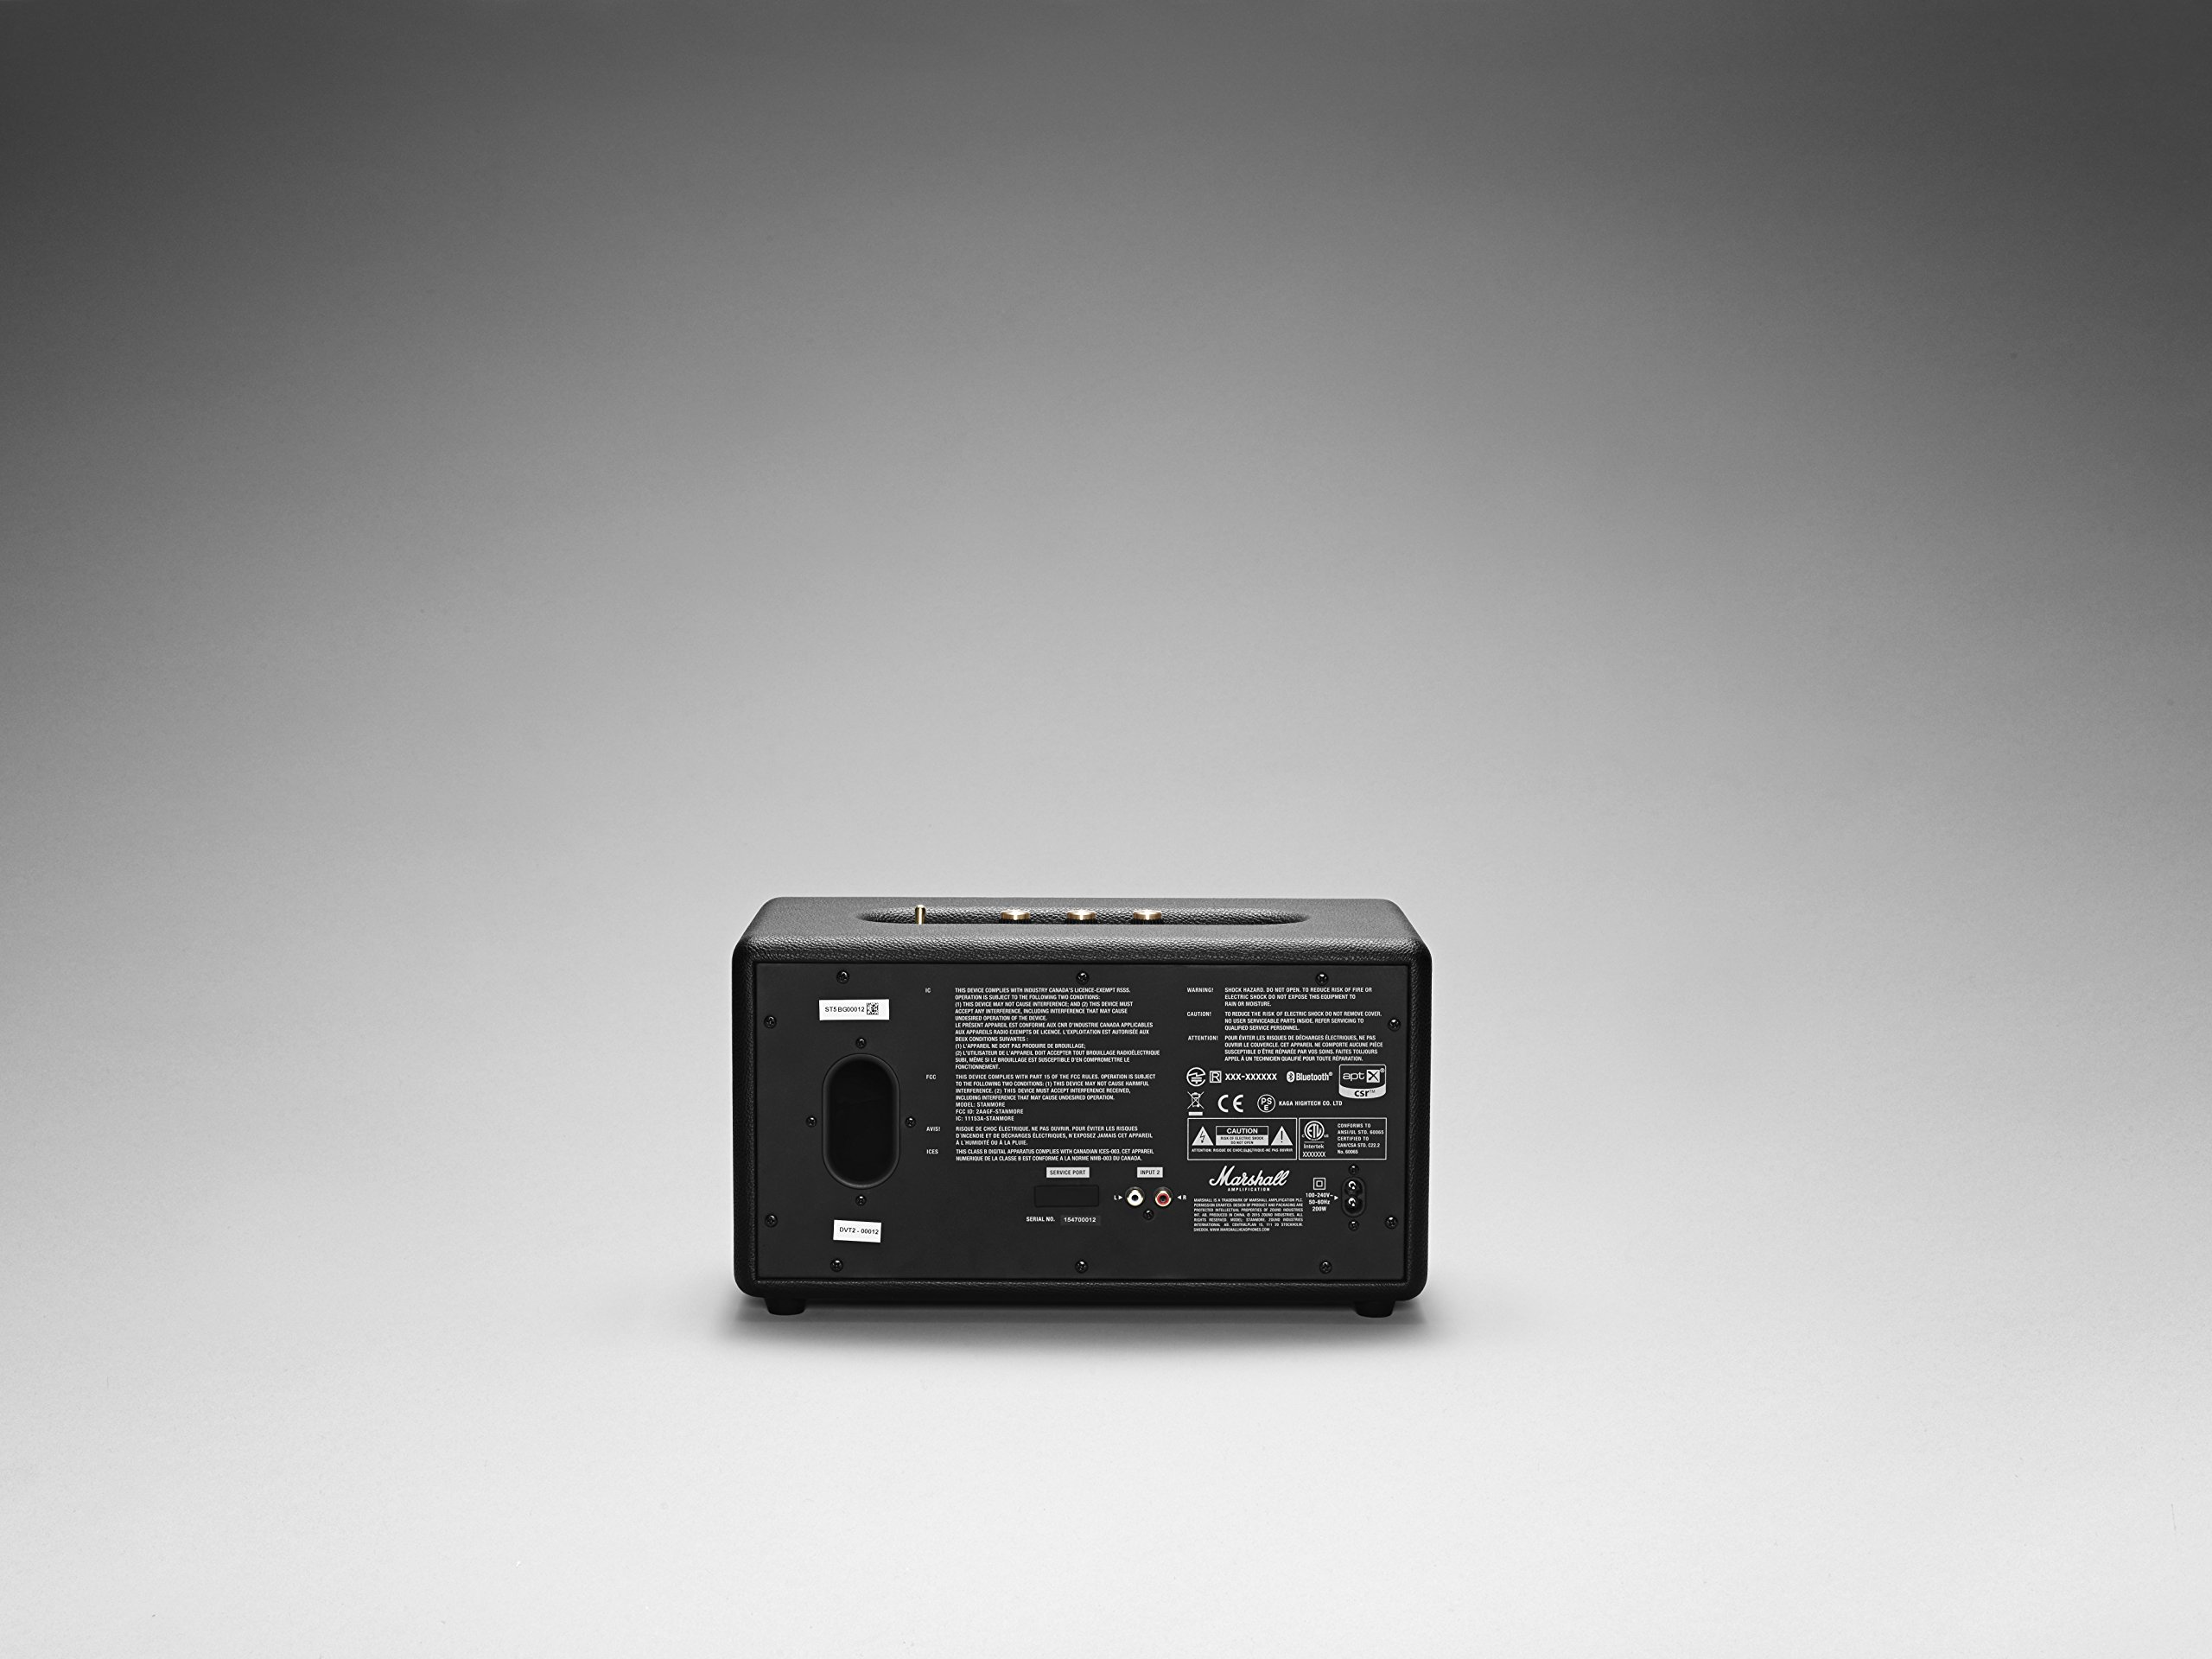 Marshall Stanmore Bluetooth Speaker, Black (04091627) by Marshall (Image #2)